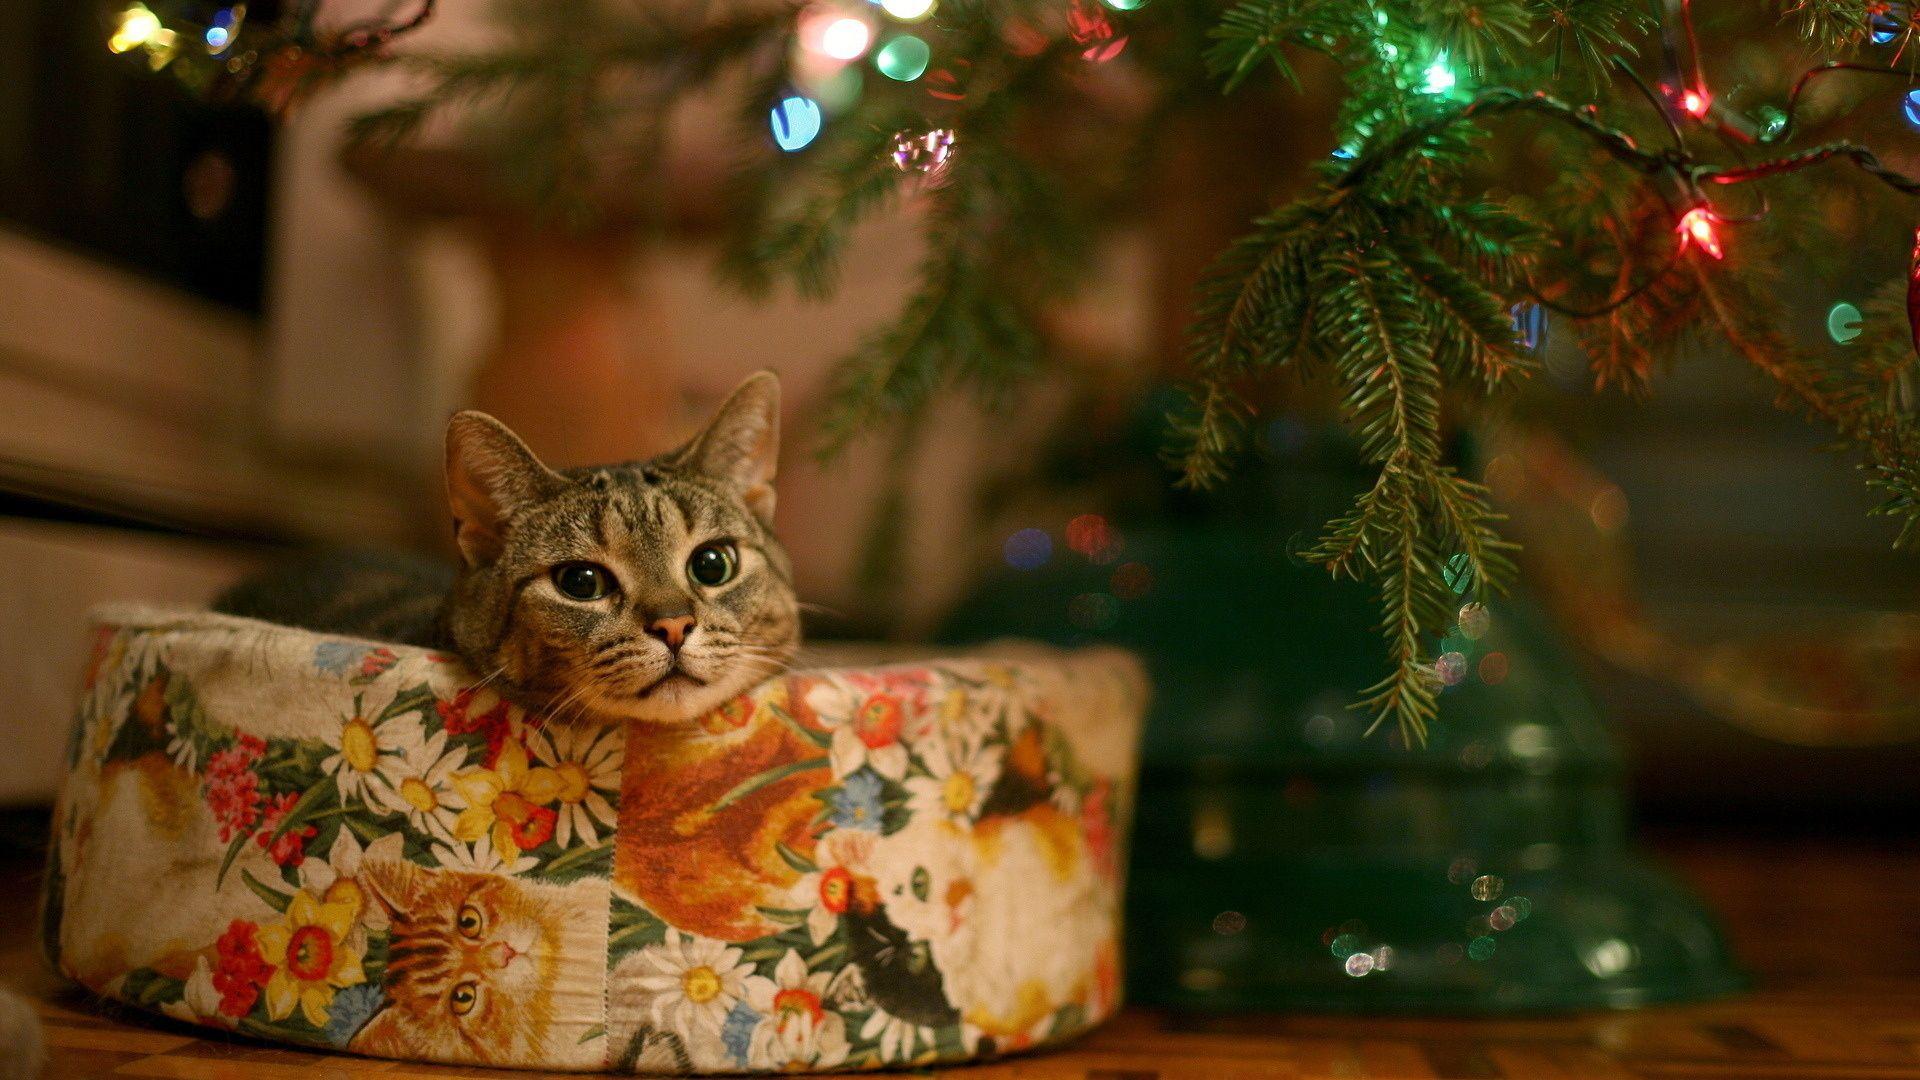 Christmas Hd Wallpaper 1080p 1920x1080 Christmas Cats Cats Cat Wallpaper